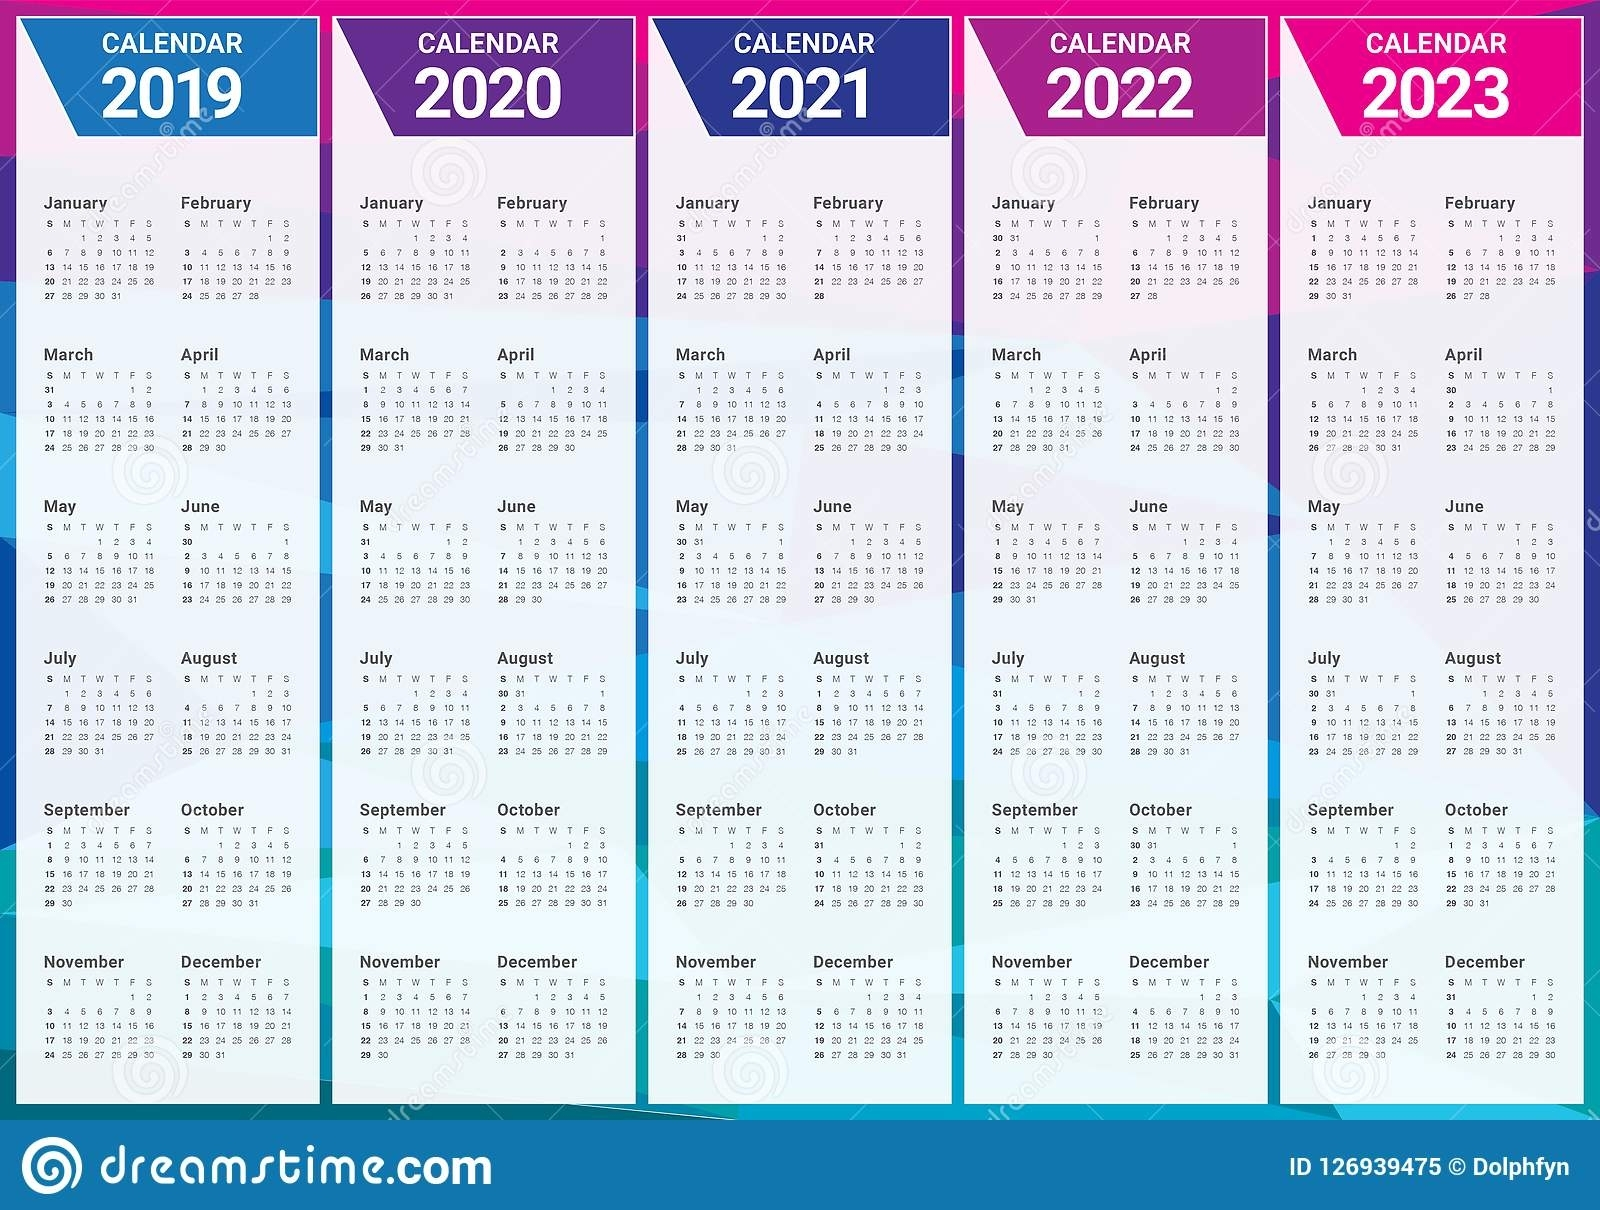 Year 2019 2020 2021 2022 2023 Calendar Vector Design inside Yearly Calendar 2020 2021 2022 2023